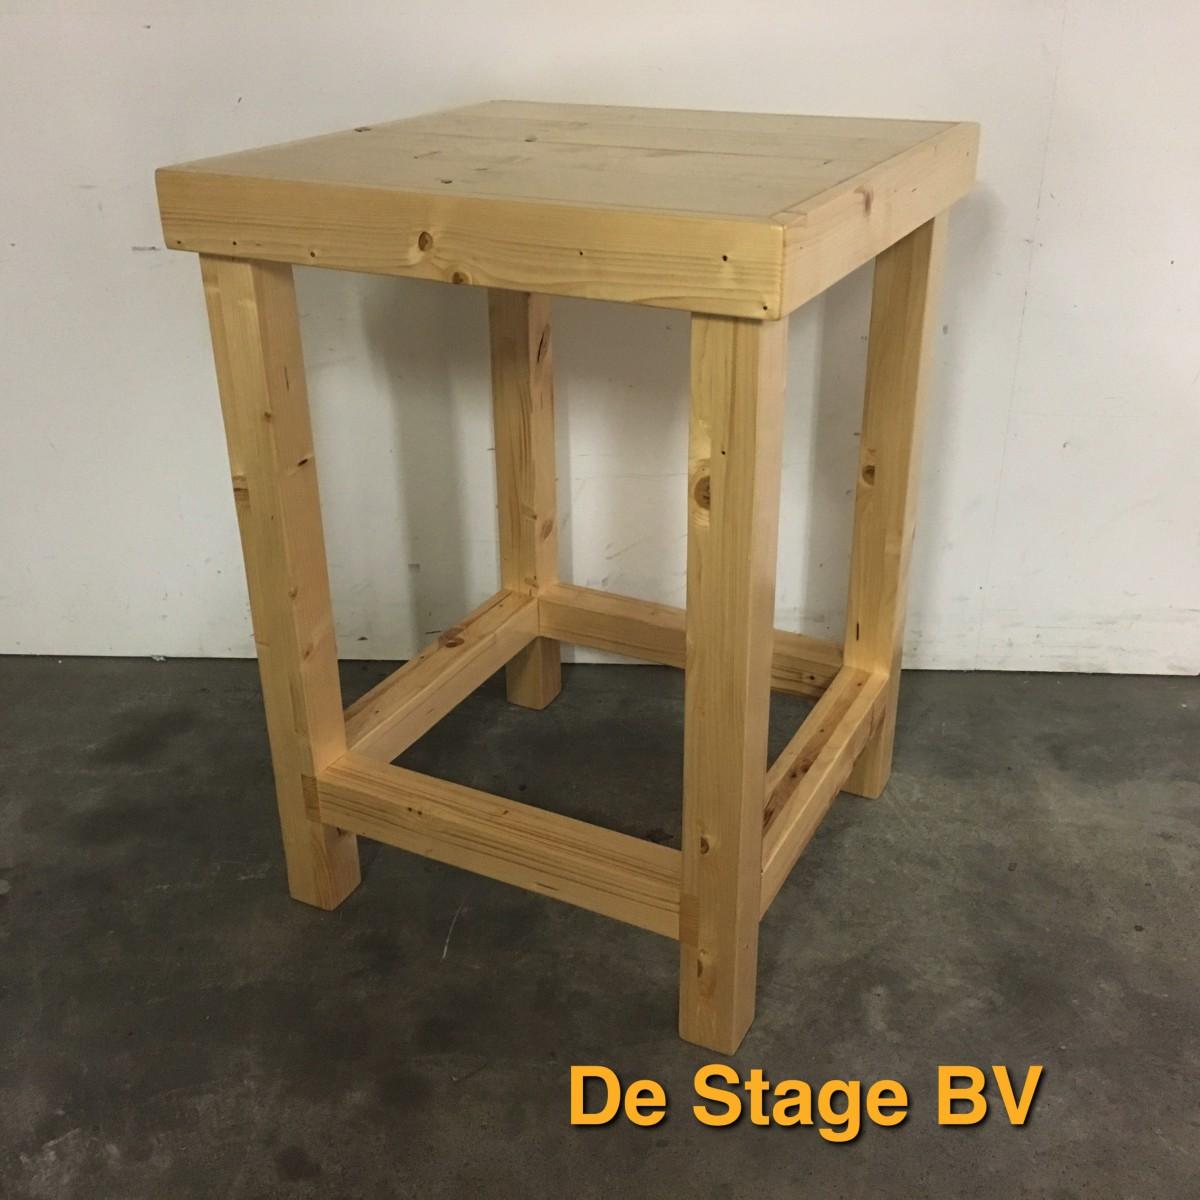 Bekend Statafel Steigerhout 80×80 cm (Huur) – De Stage BV IJ51